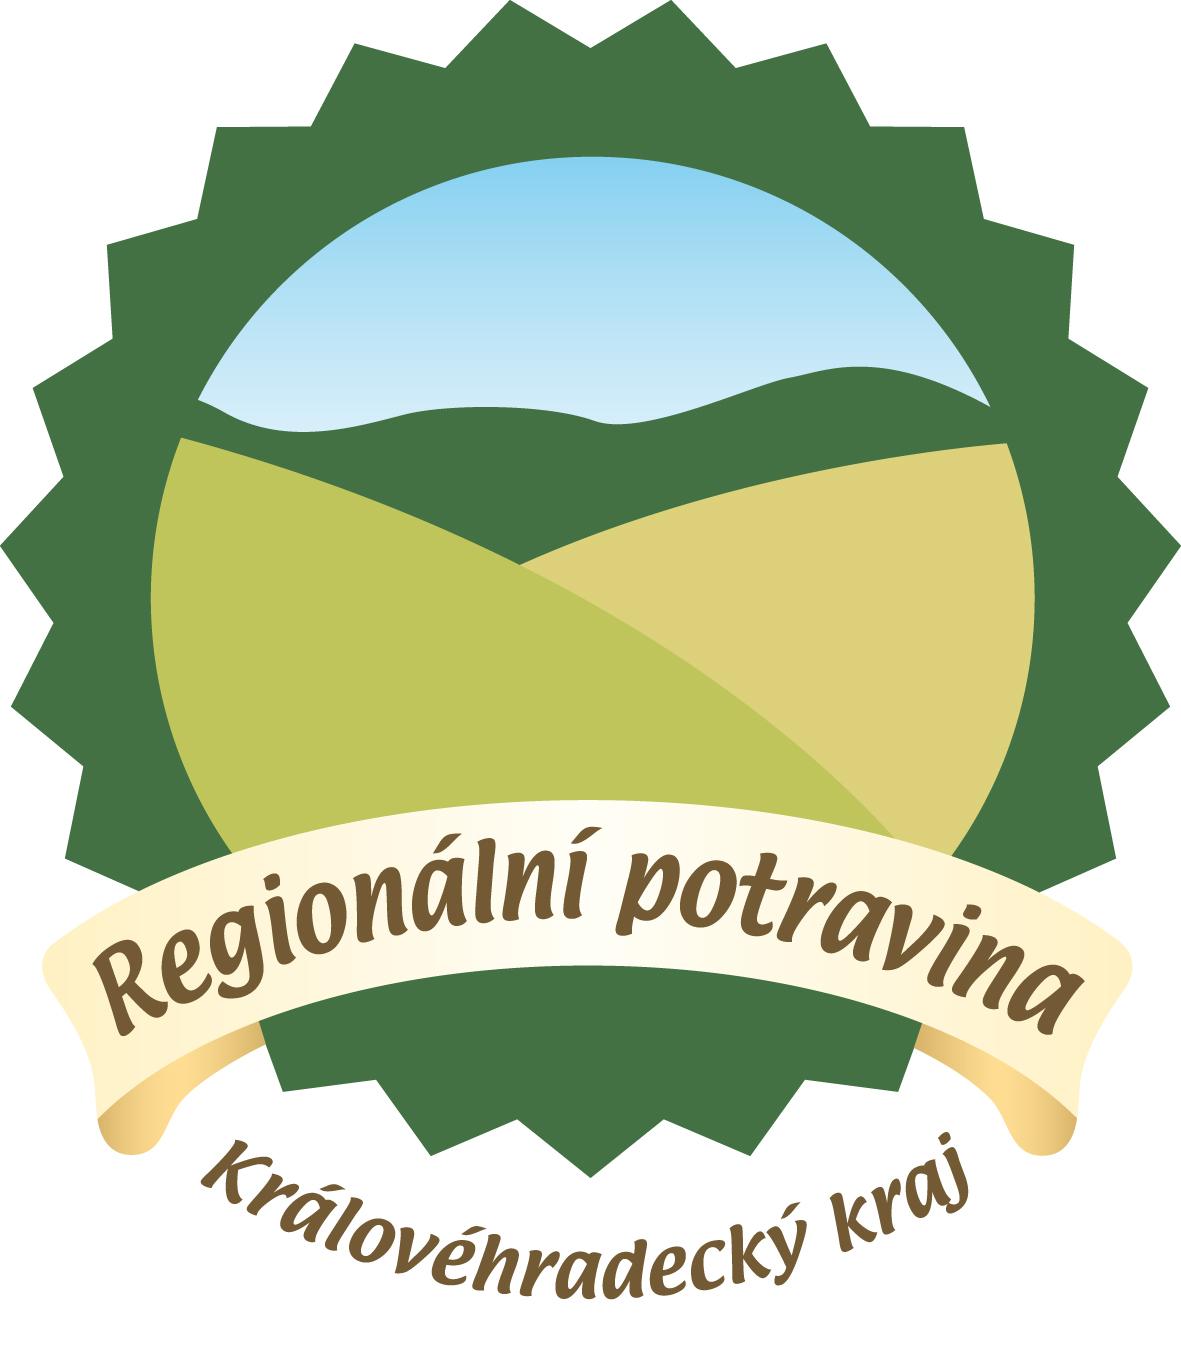 https://primator.cz/wp-content/uploads/2018/02/logo-regionalni-potravina-KRK.jpg